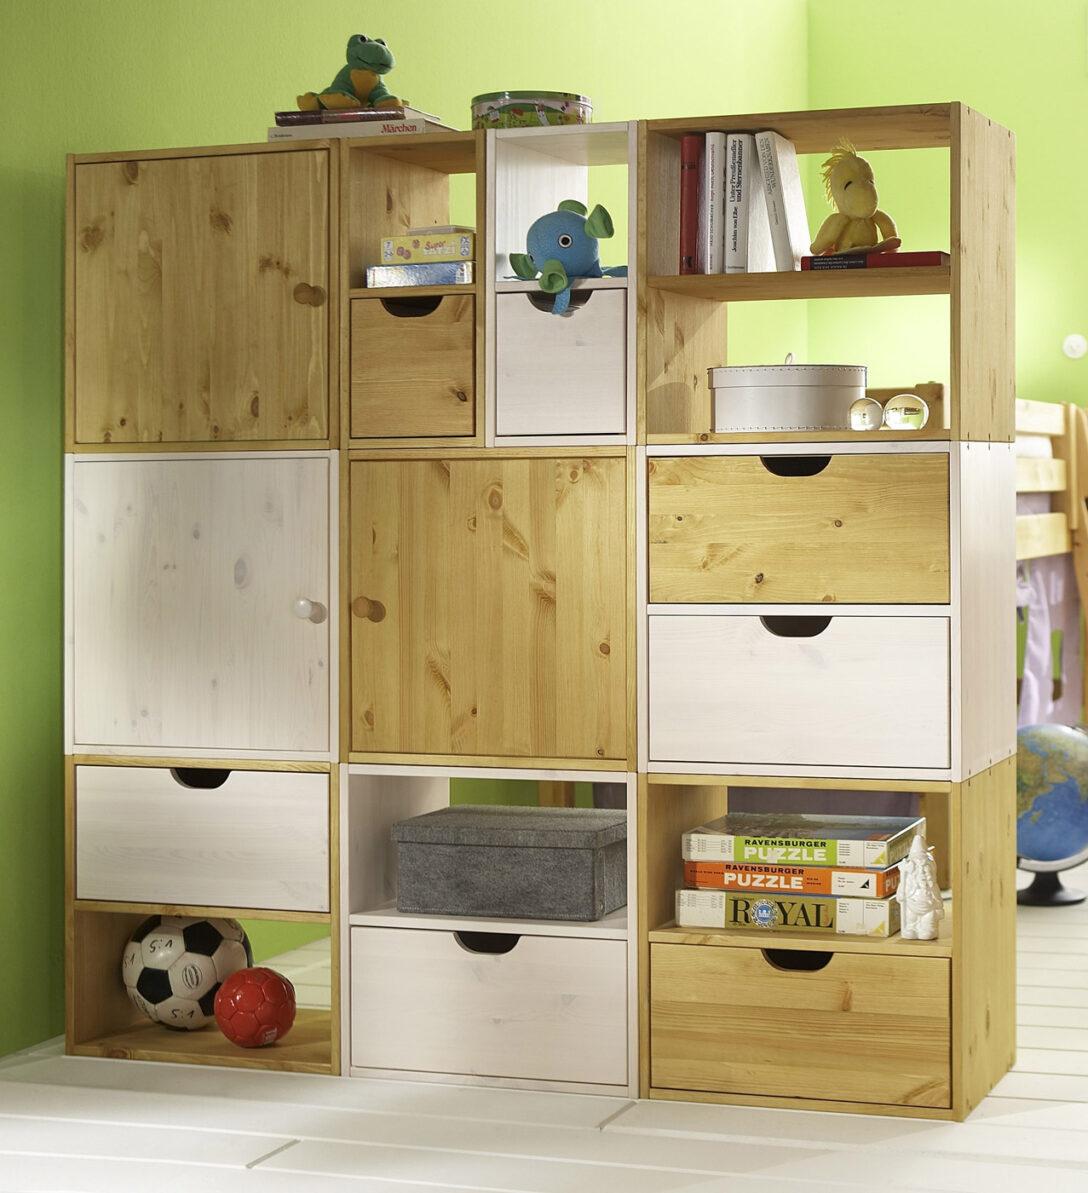 Large Size of Raumteiler Kinderzimmer Kids Paradise Wrfelregal Fr Das Bettende Regal Weiß Regale Sofa Kinderzimmer Raumteiler Kinderzimmer